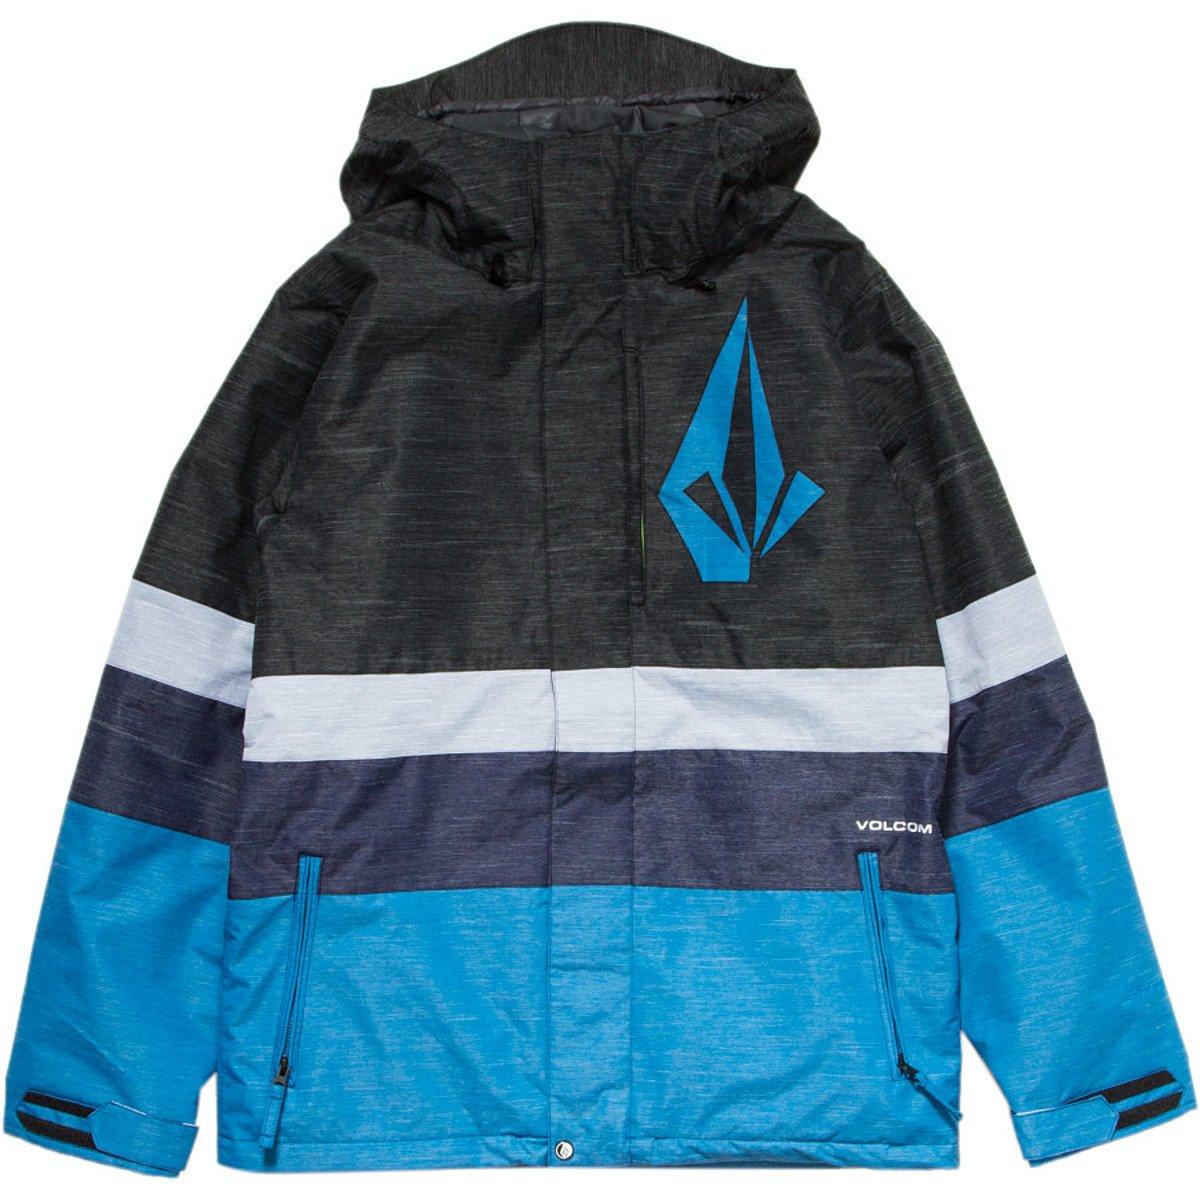 Herren Snowboard Jacke Volcom Bias Insulated Jacket